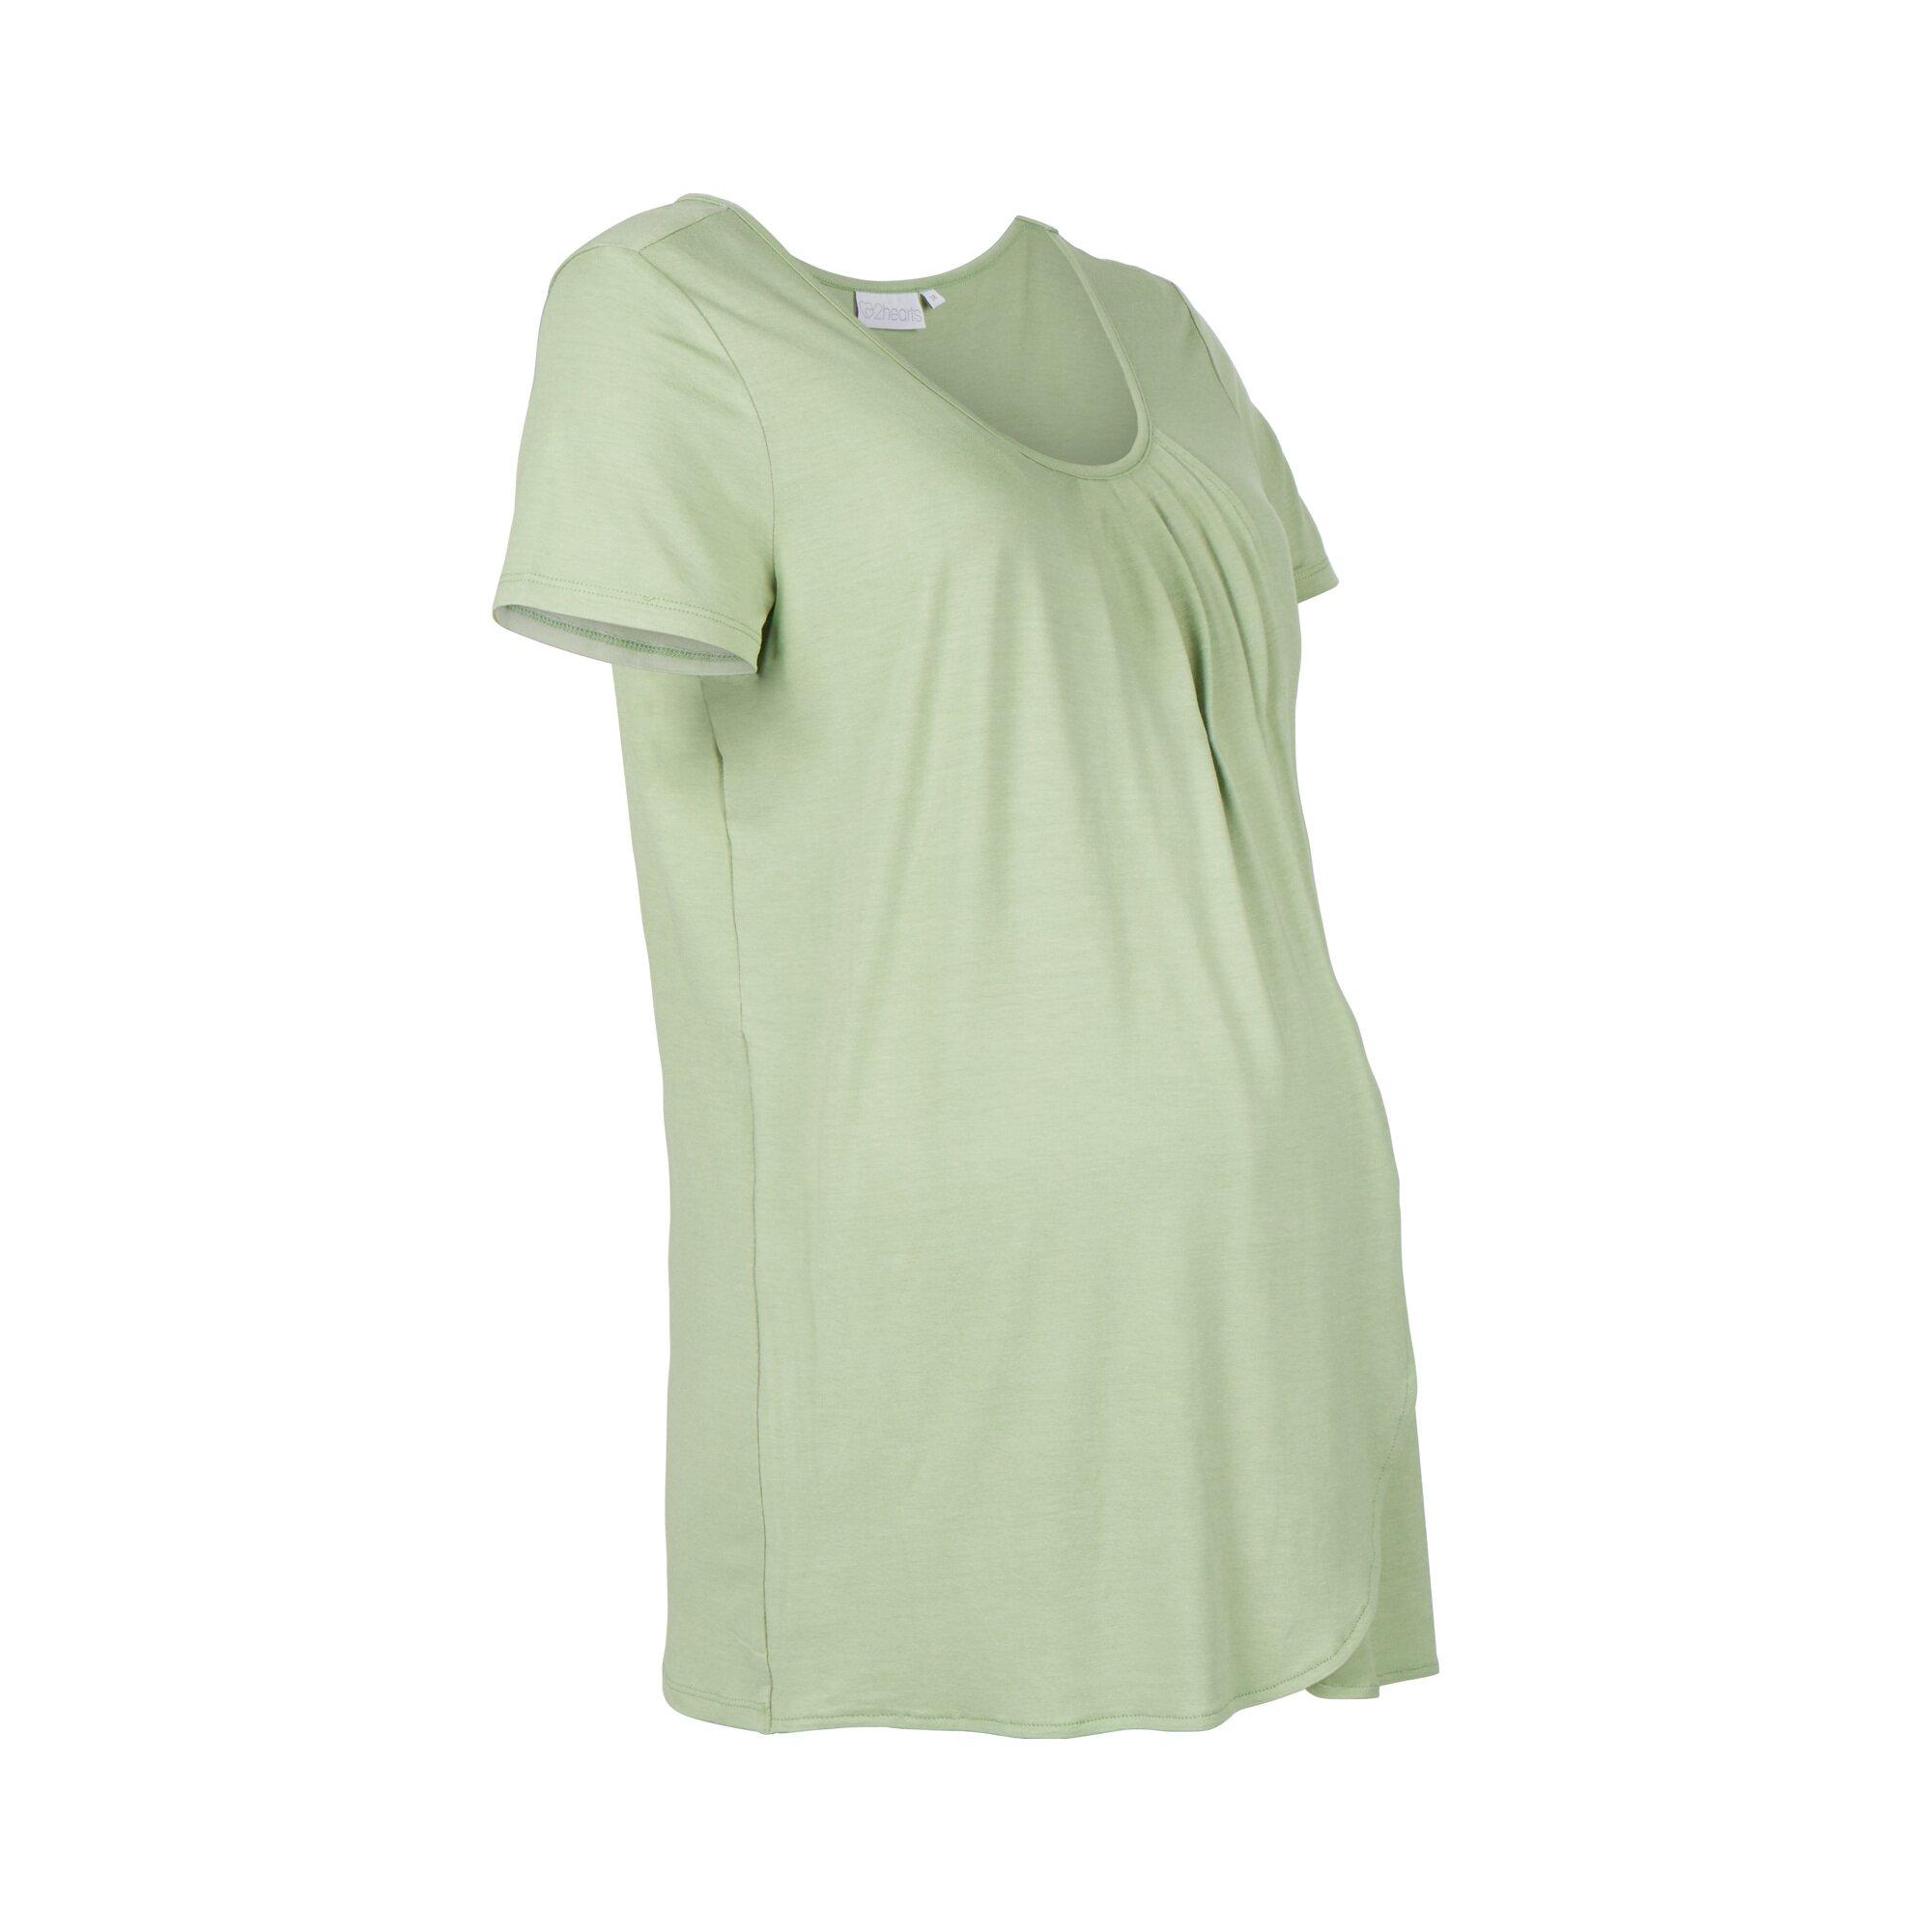 love-is-in-the-air-umstands-und-still-t-shirt